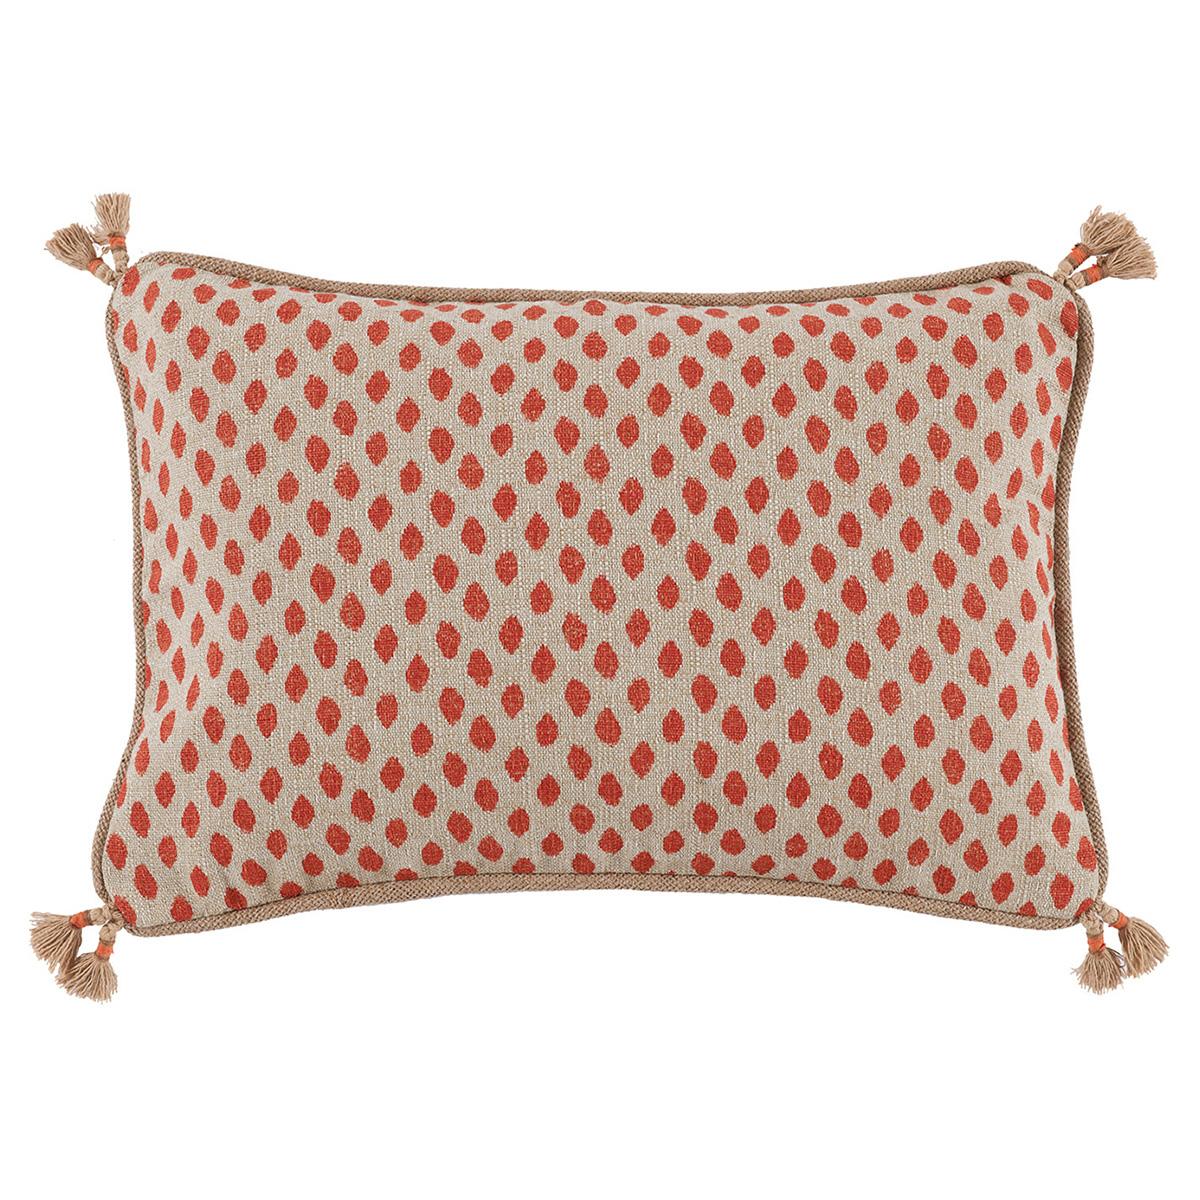 Milia Bazaar Red Tribal Dot Tassel Trim Beige Pillow - 13x19